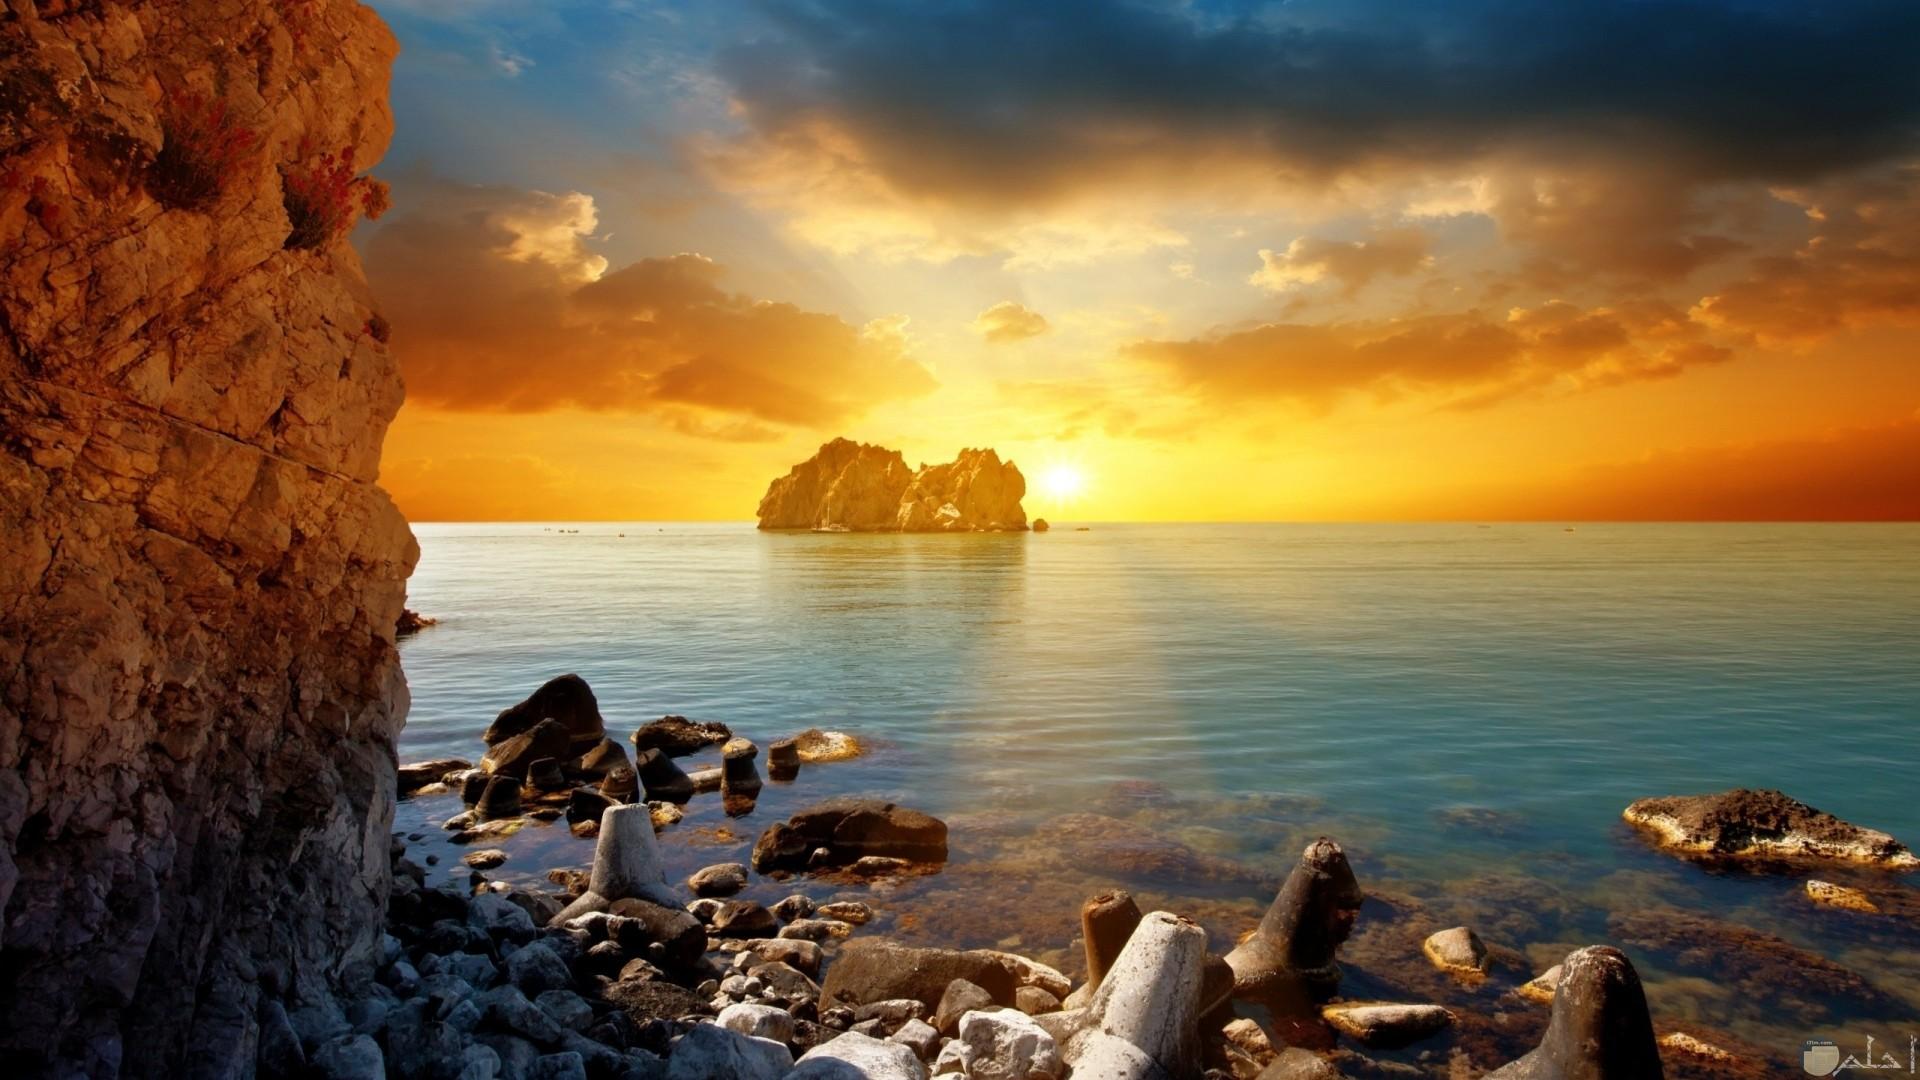 مشهد خلاب للبحر